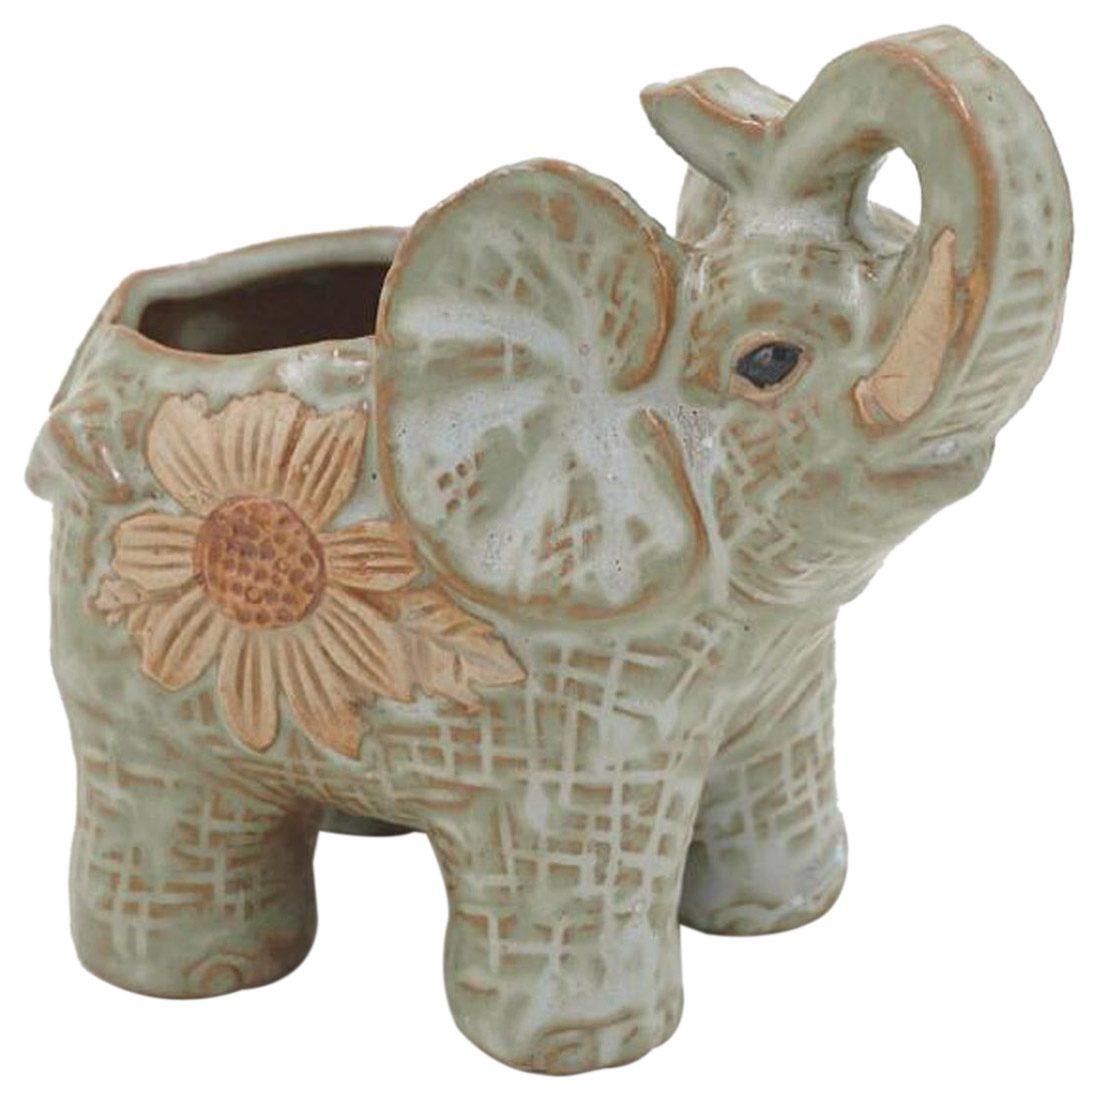 HLZS-Ceramic Mini Elephant Cacti Succulent Plant Pot Flower Planter Garden Home Decor